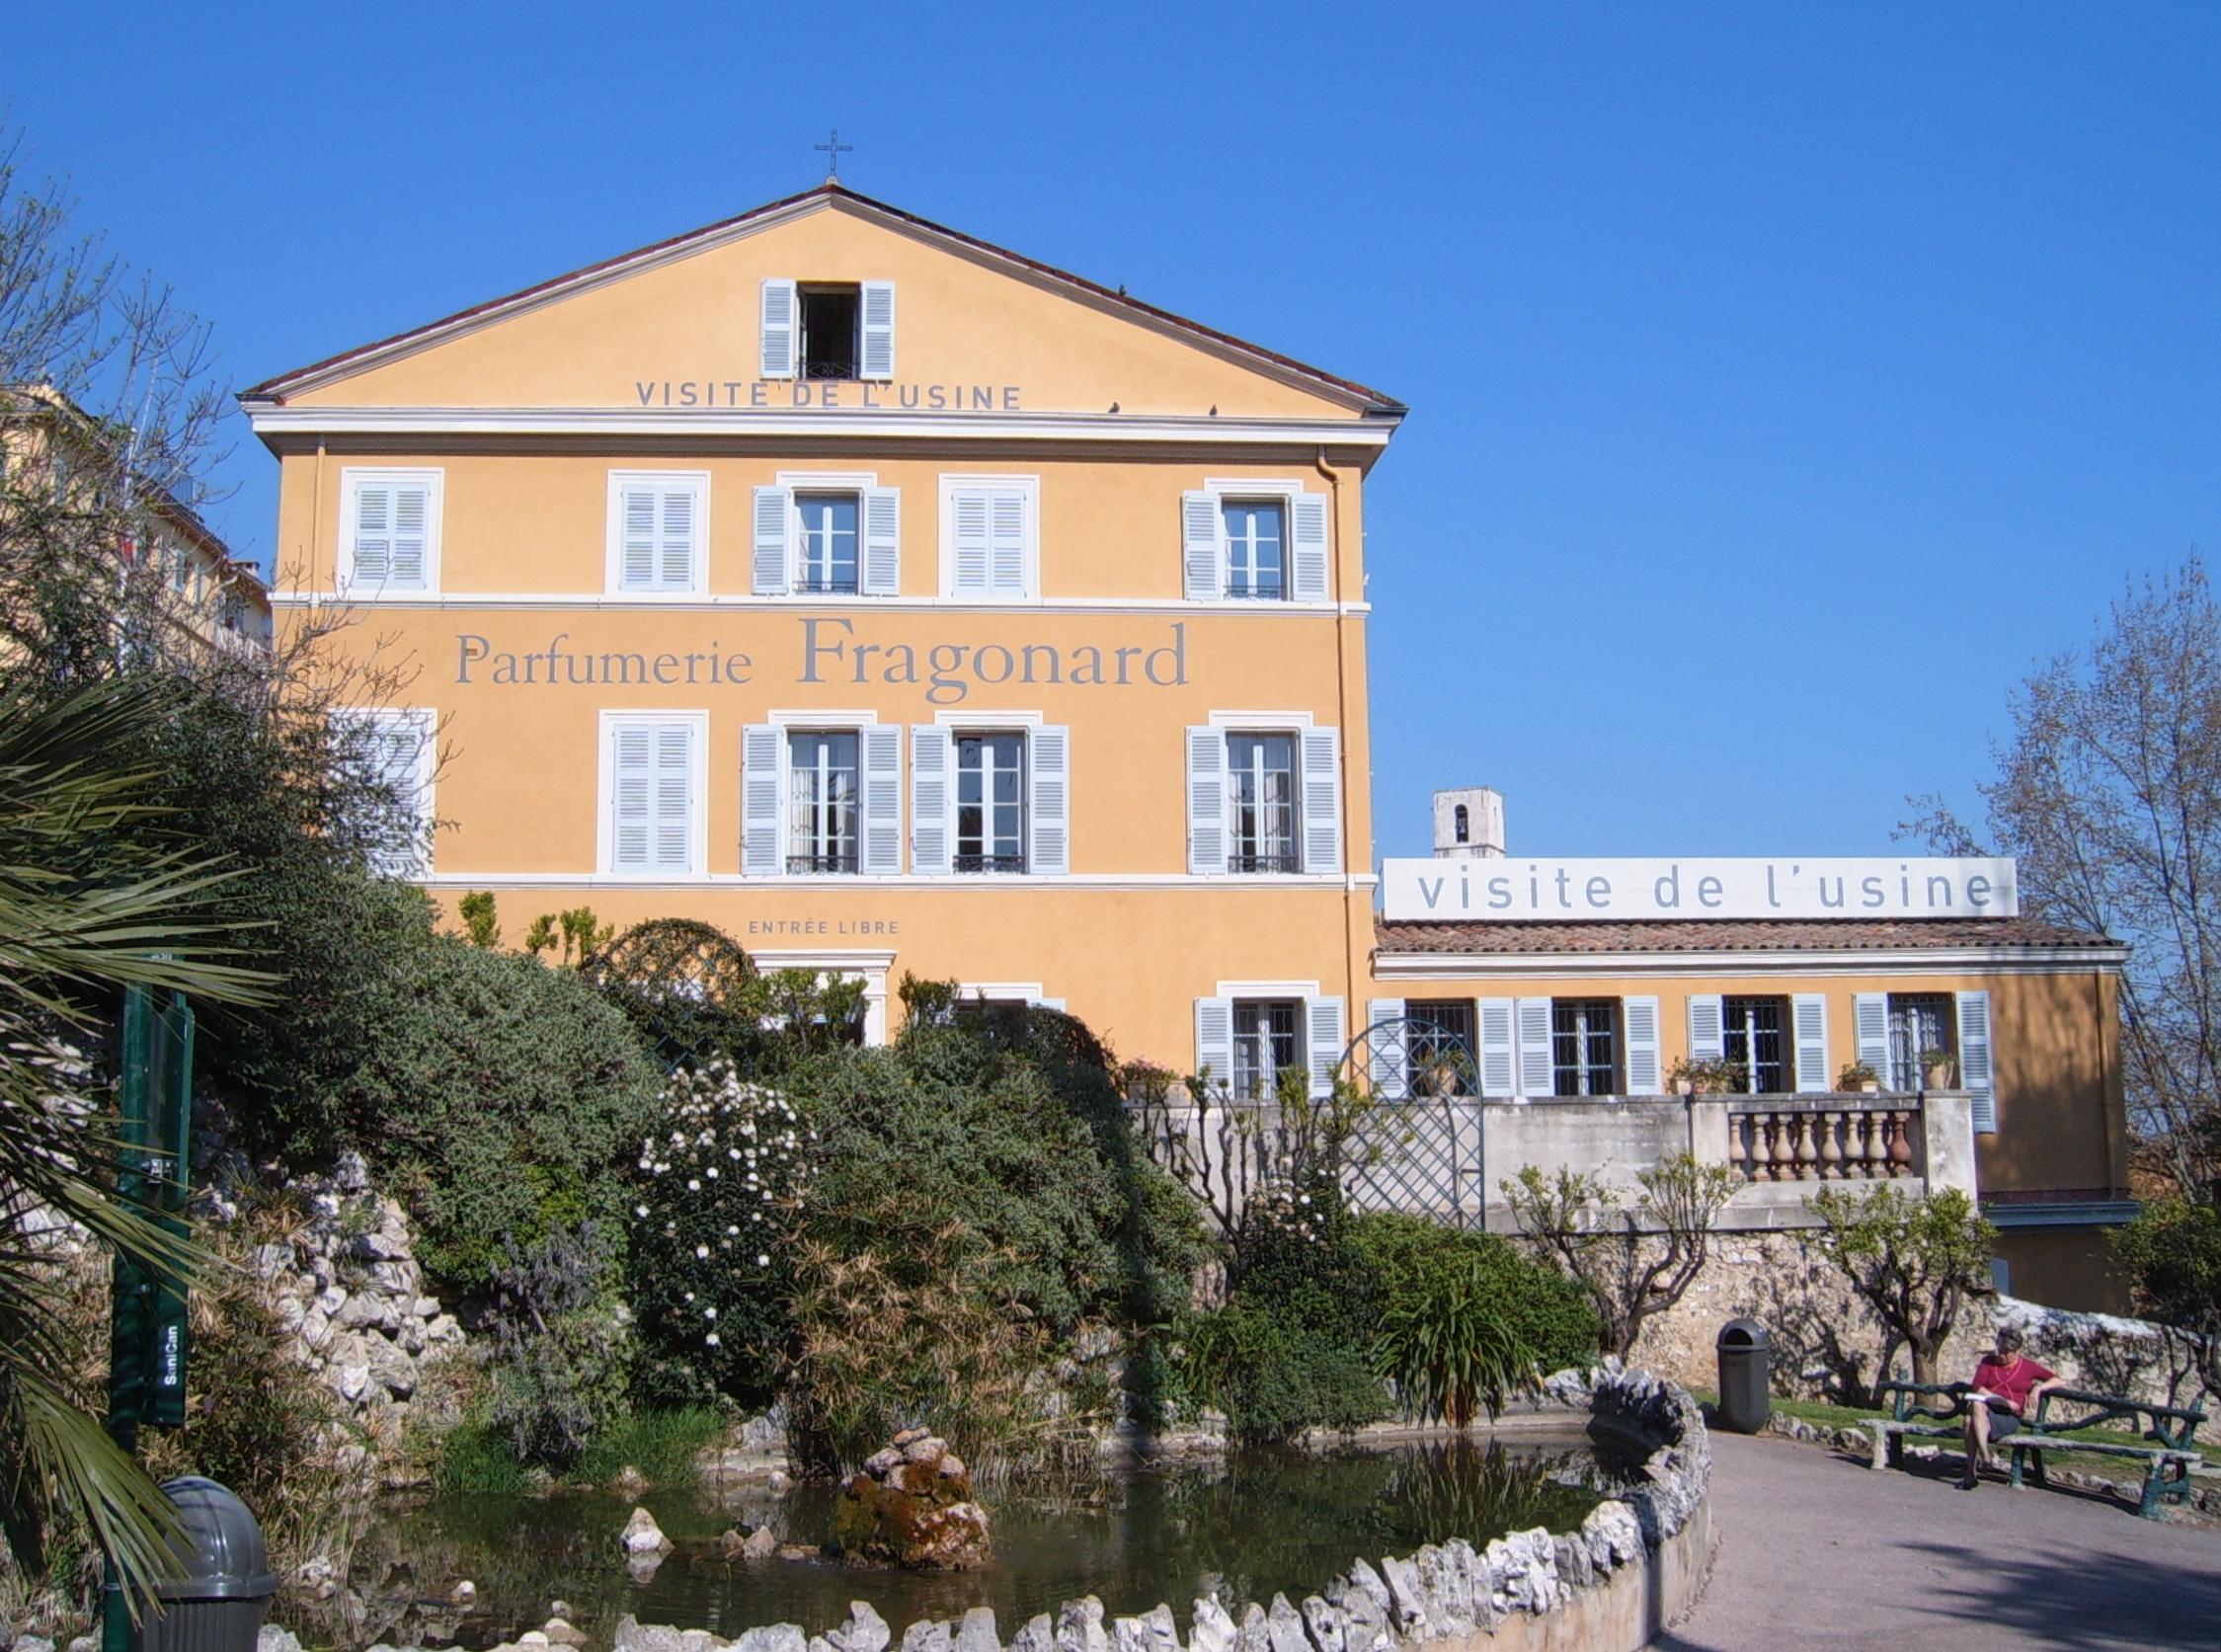 (c) https://i0.wp.com/upload.wikimedia.org/wikipedia/commons/7/7b/Parfumerie_Fragonard_Grasse.jpg